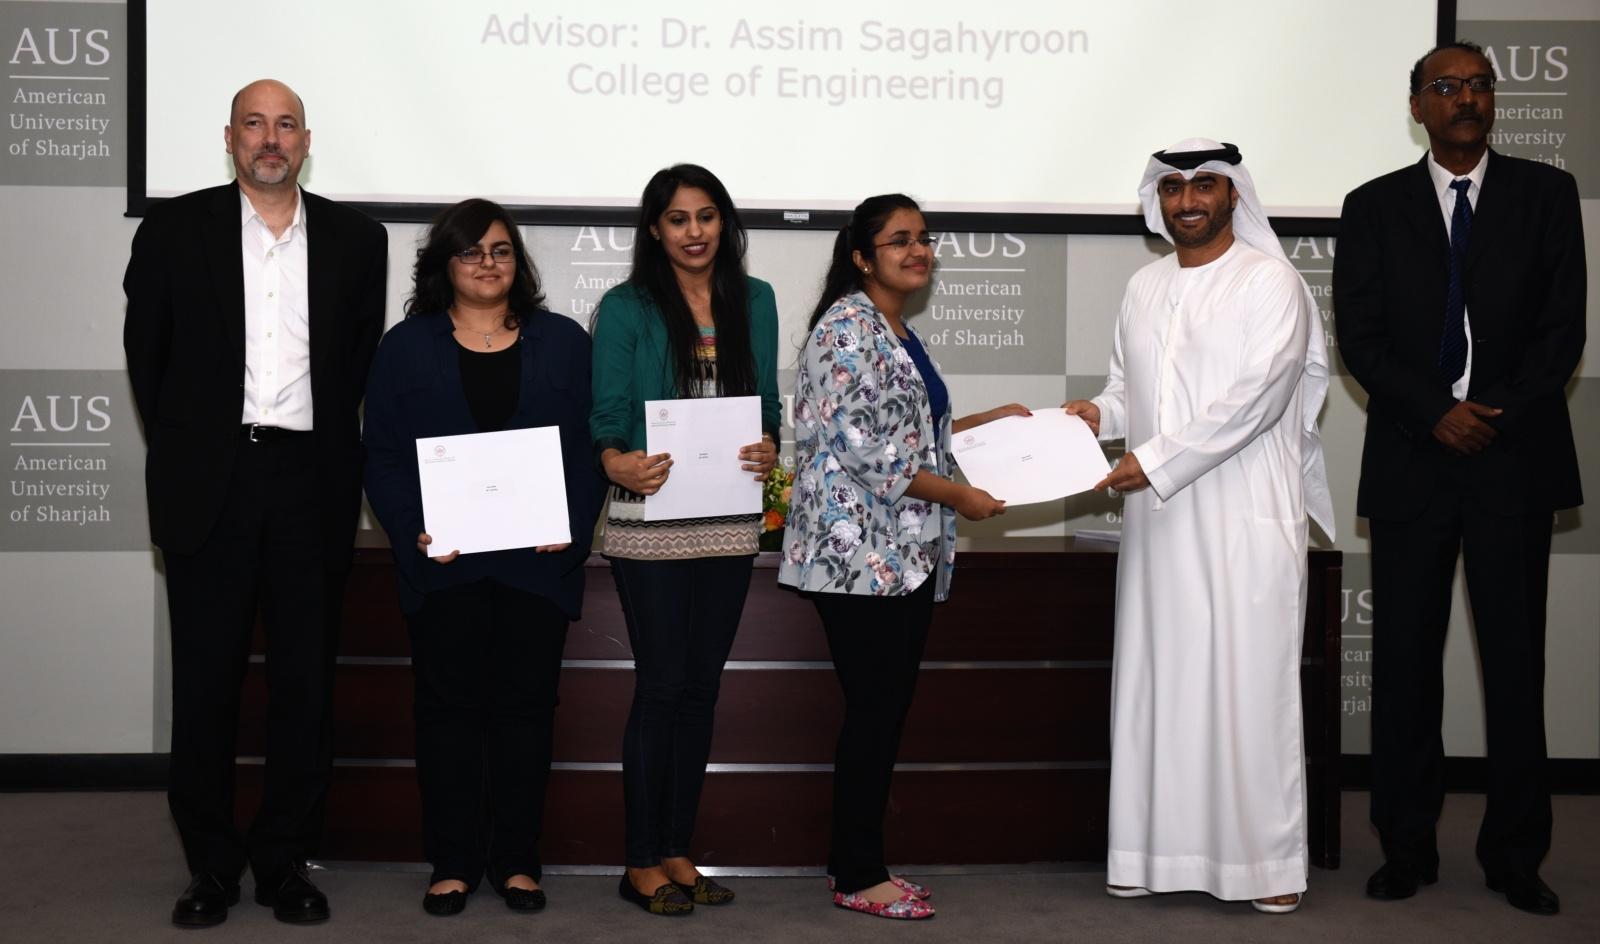 American_University_of_Sharjah_Research_3.jpg